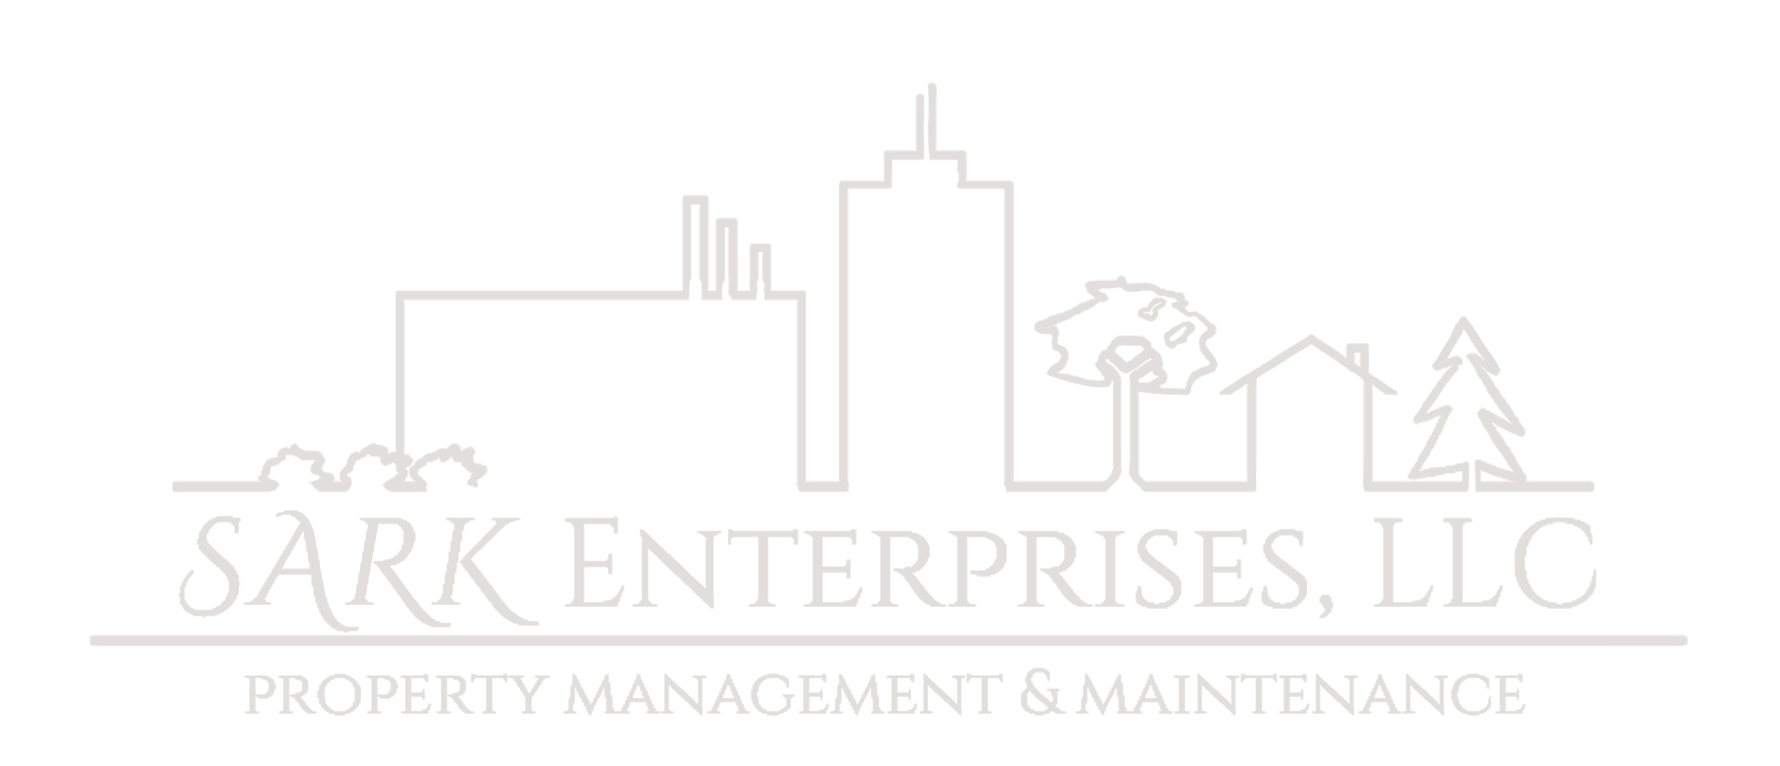 Sark Enterprises, LLC